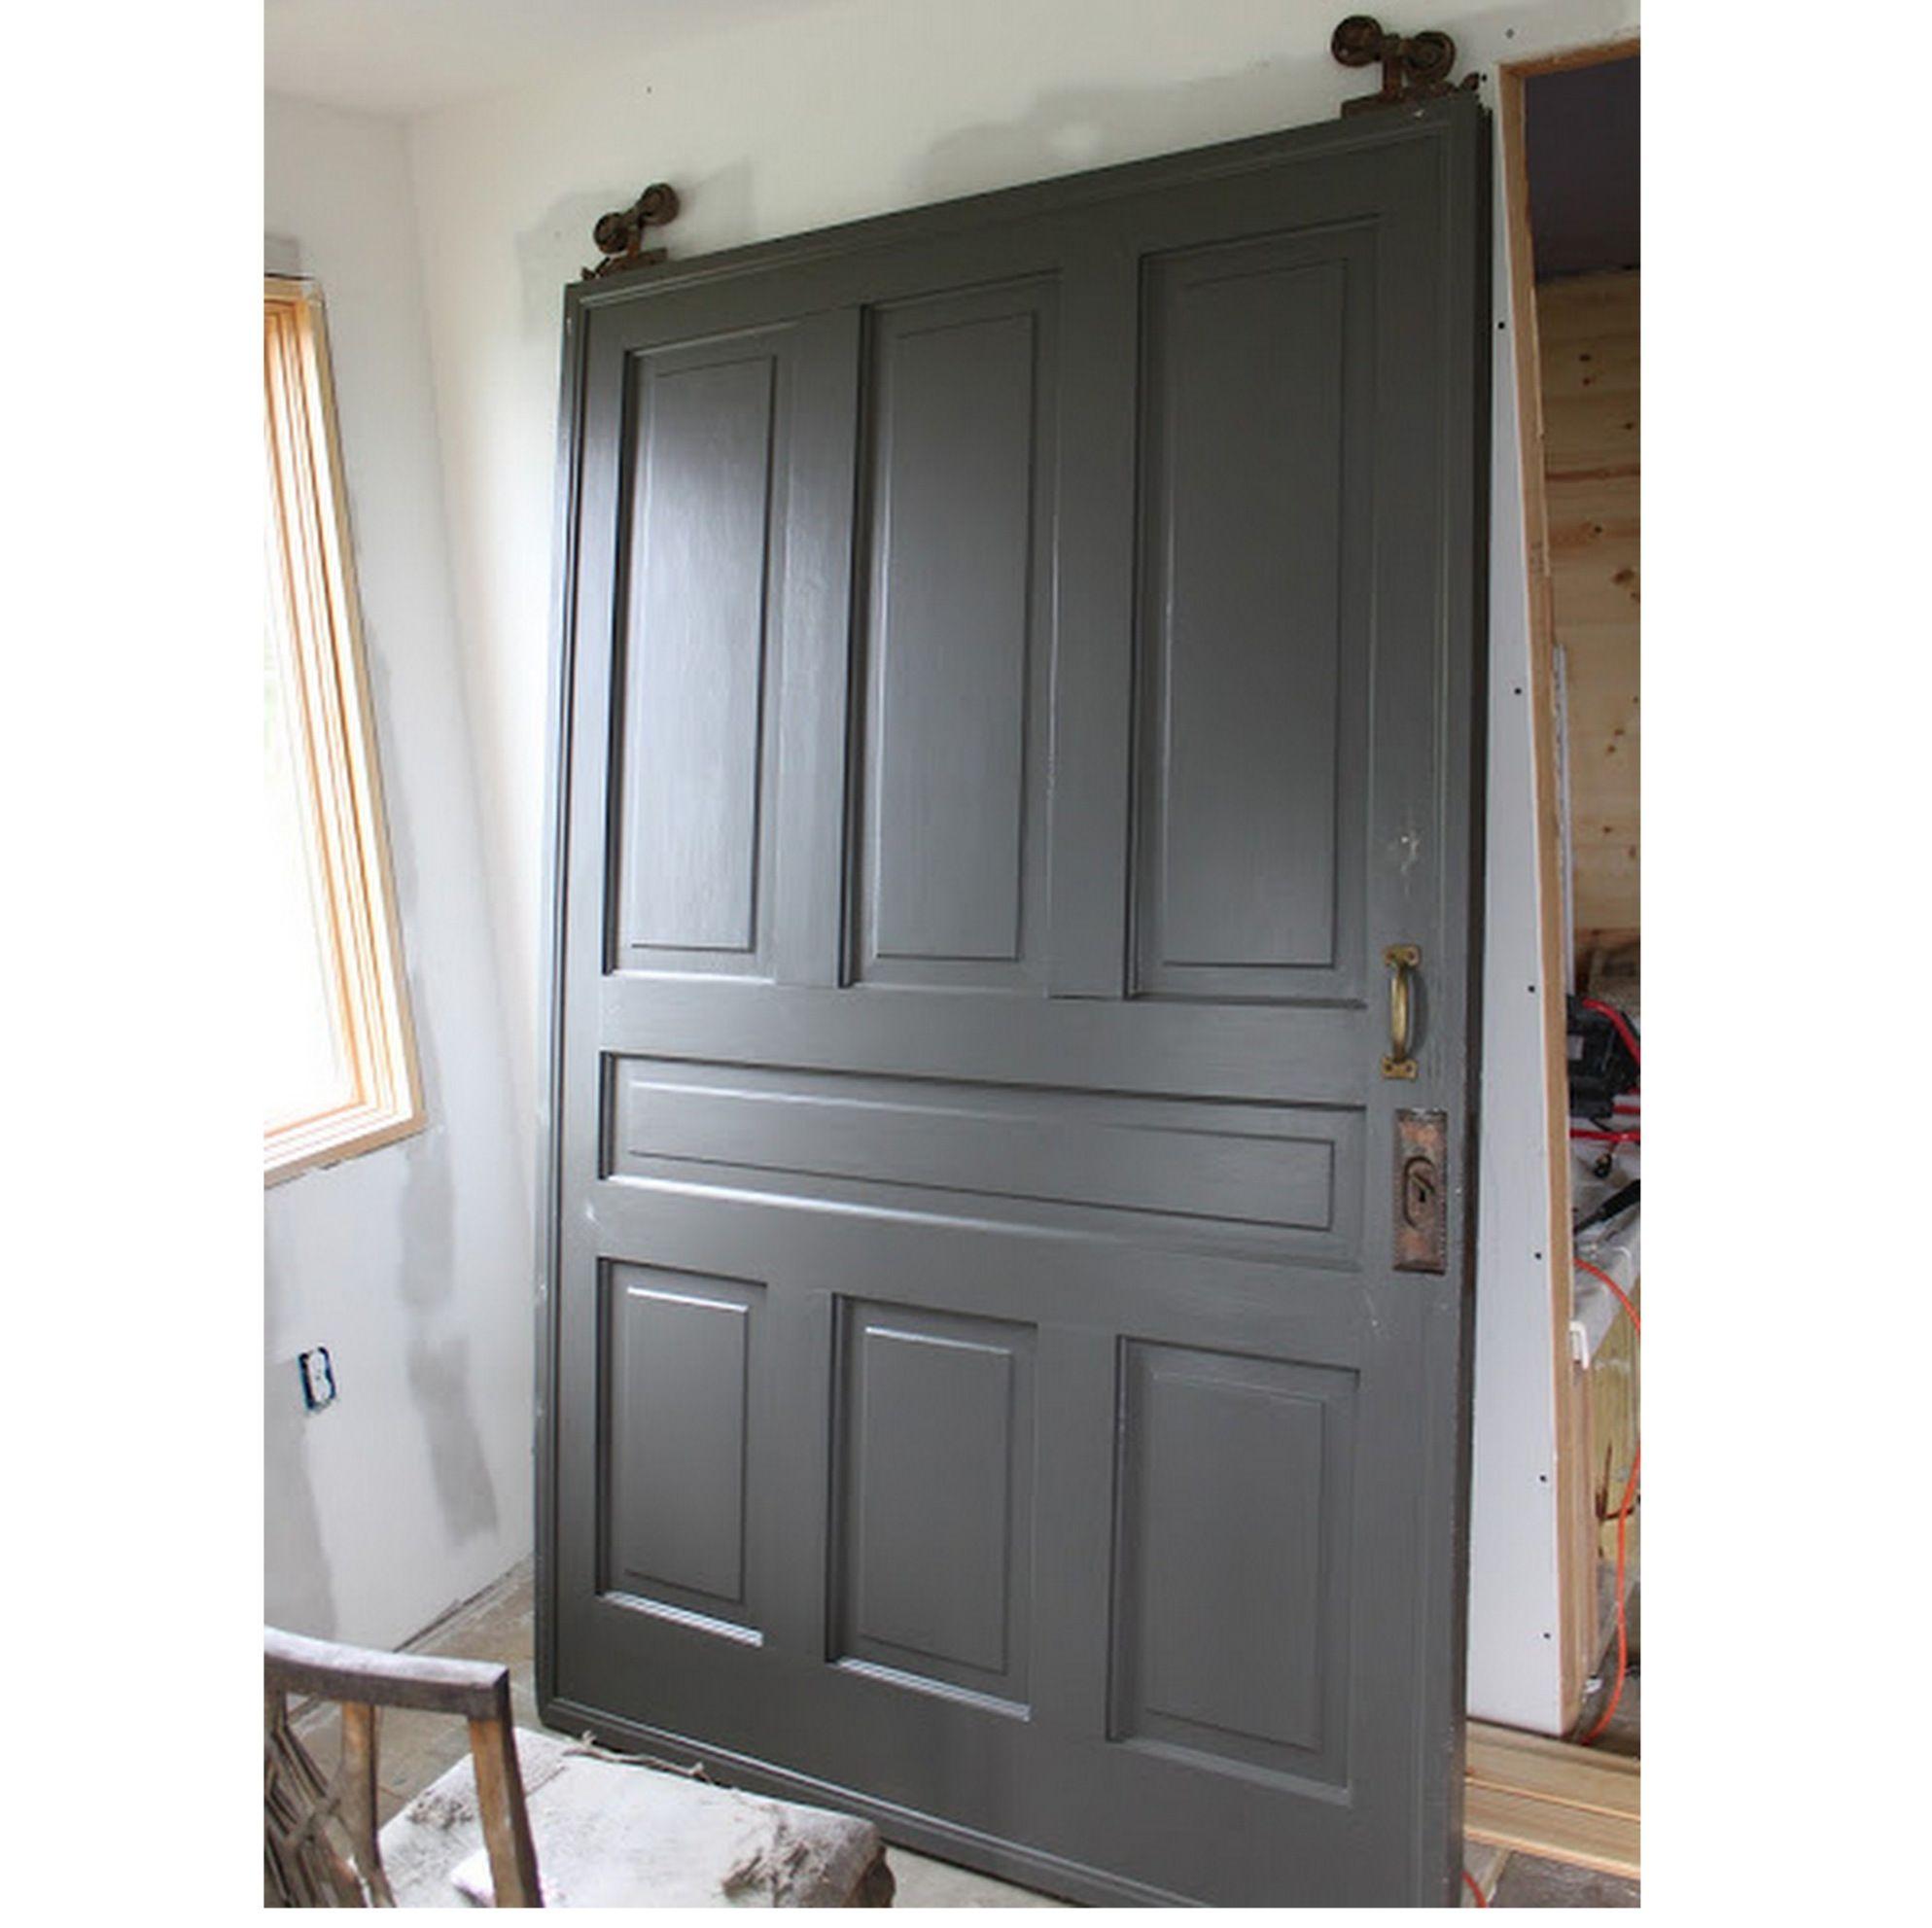 Most Popular Benjamin Moore Paint Colors Interior Door Colors Paint Colors Benjamin Moore Rustic Bathroom Designs